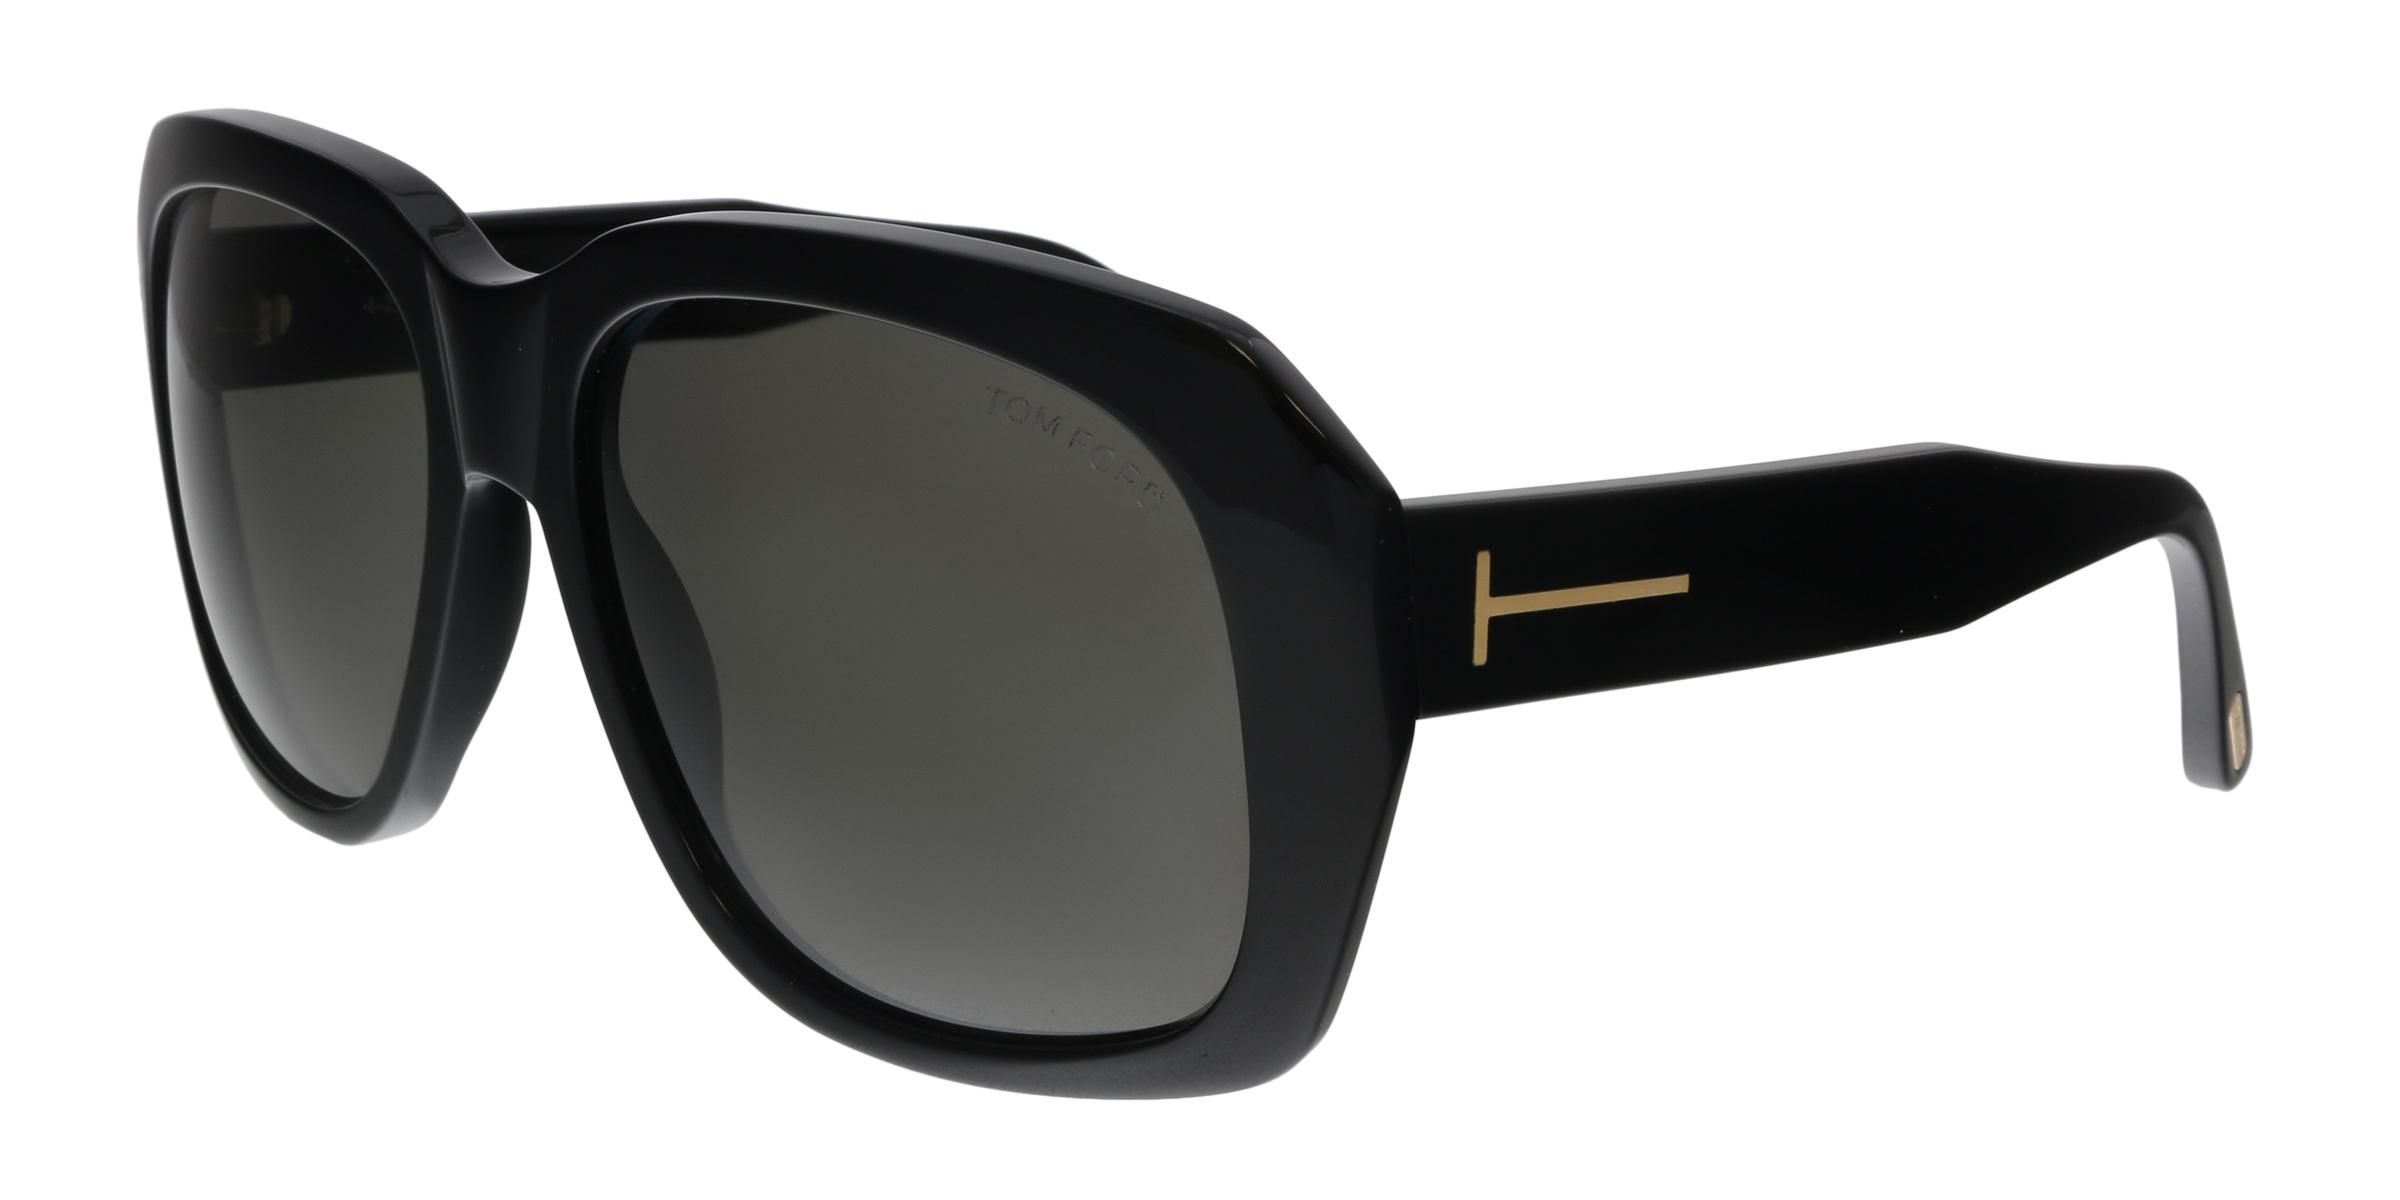 da9c694b935 Tom Ford FT0635 01A Andre-02 Black Square Sunglasses 664689926879